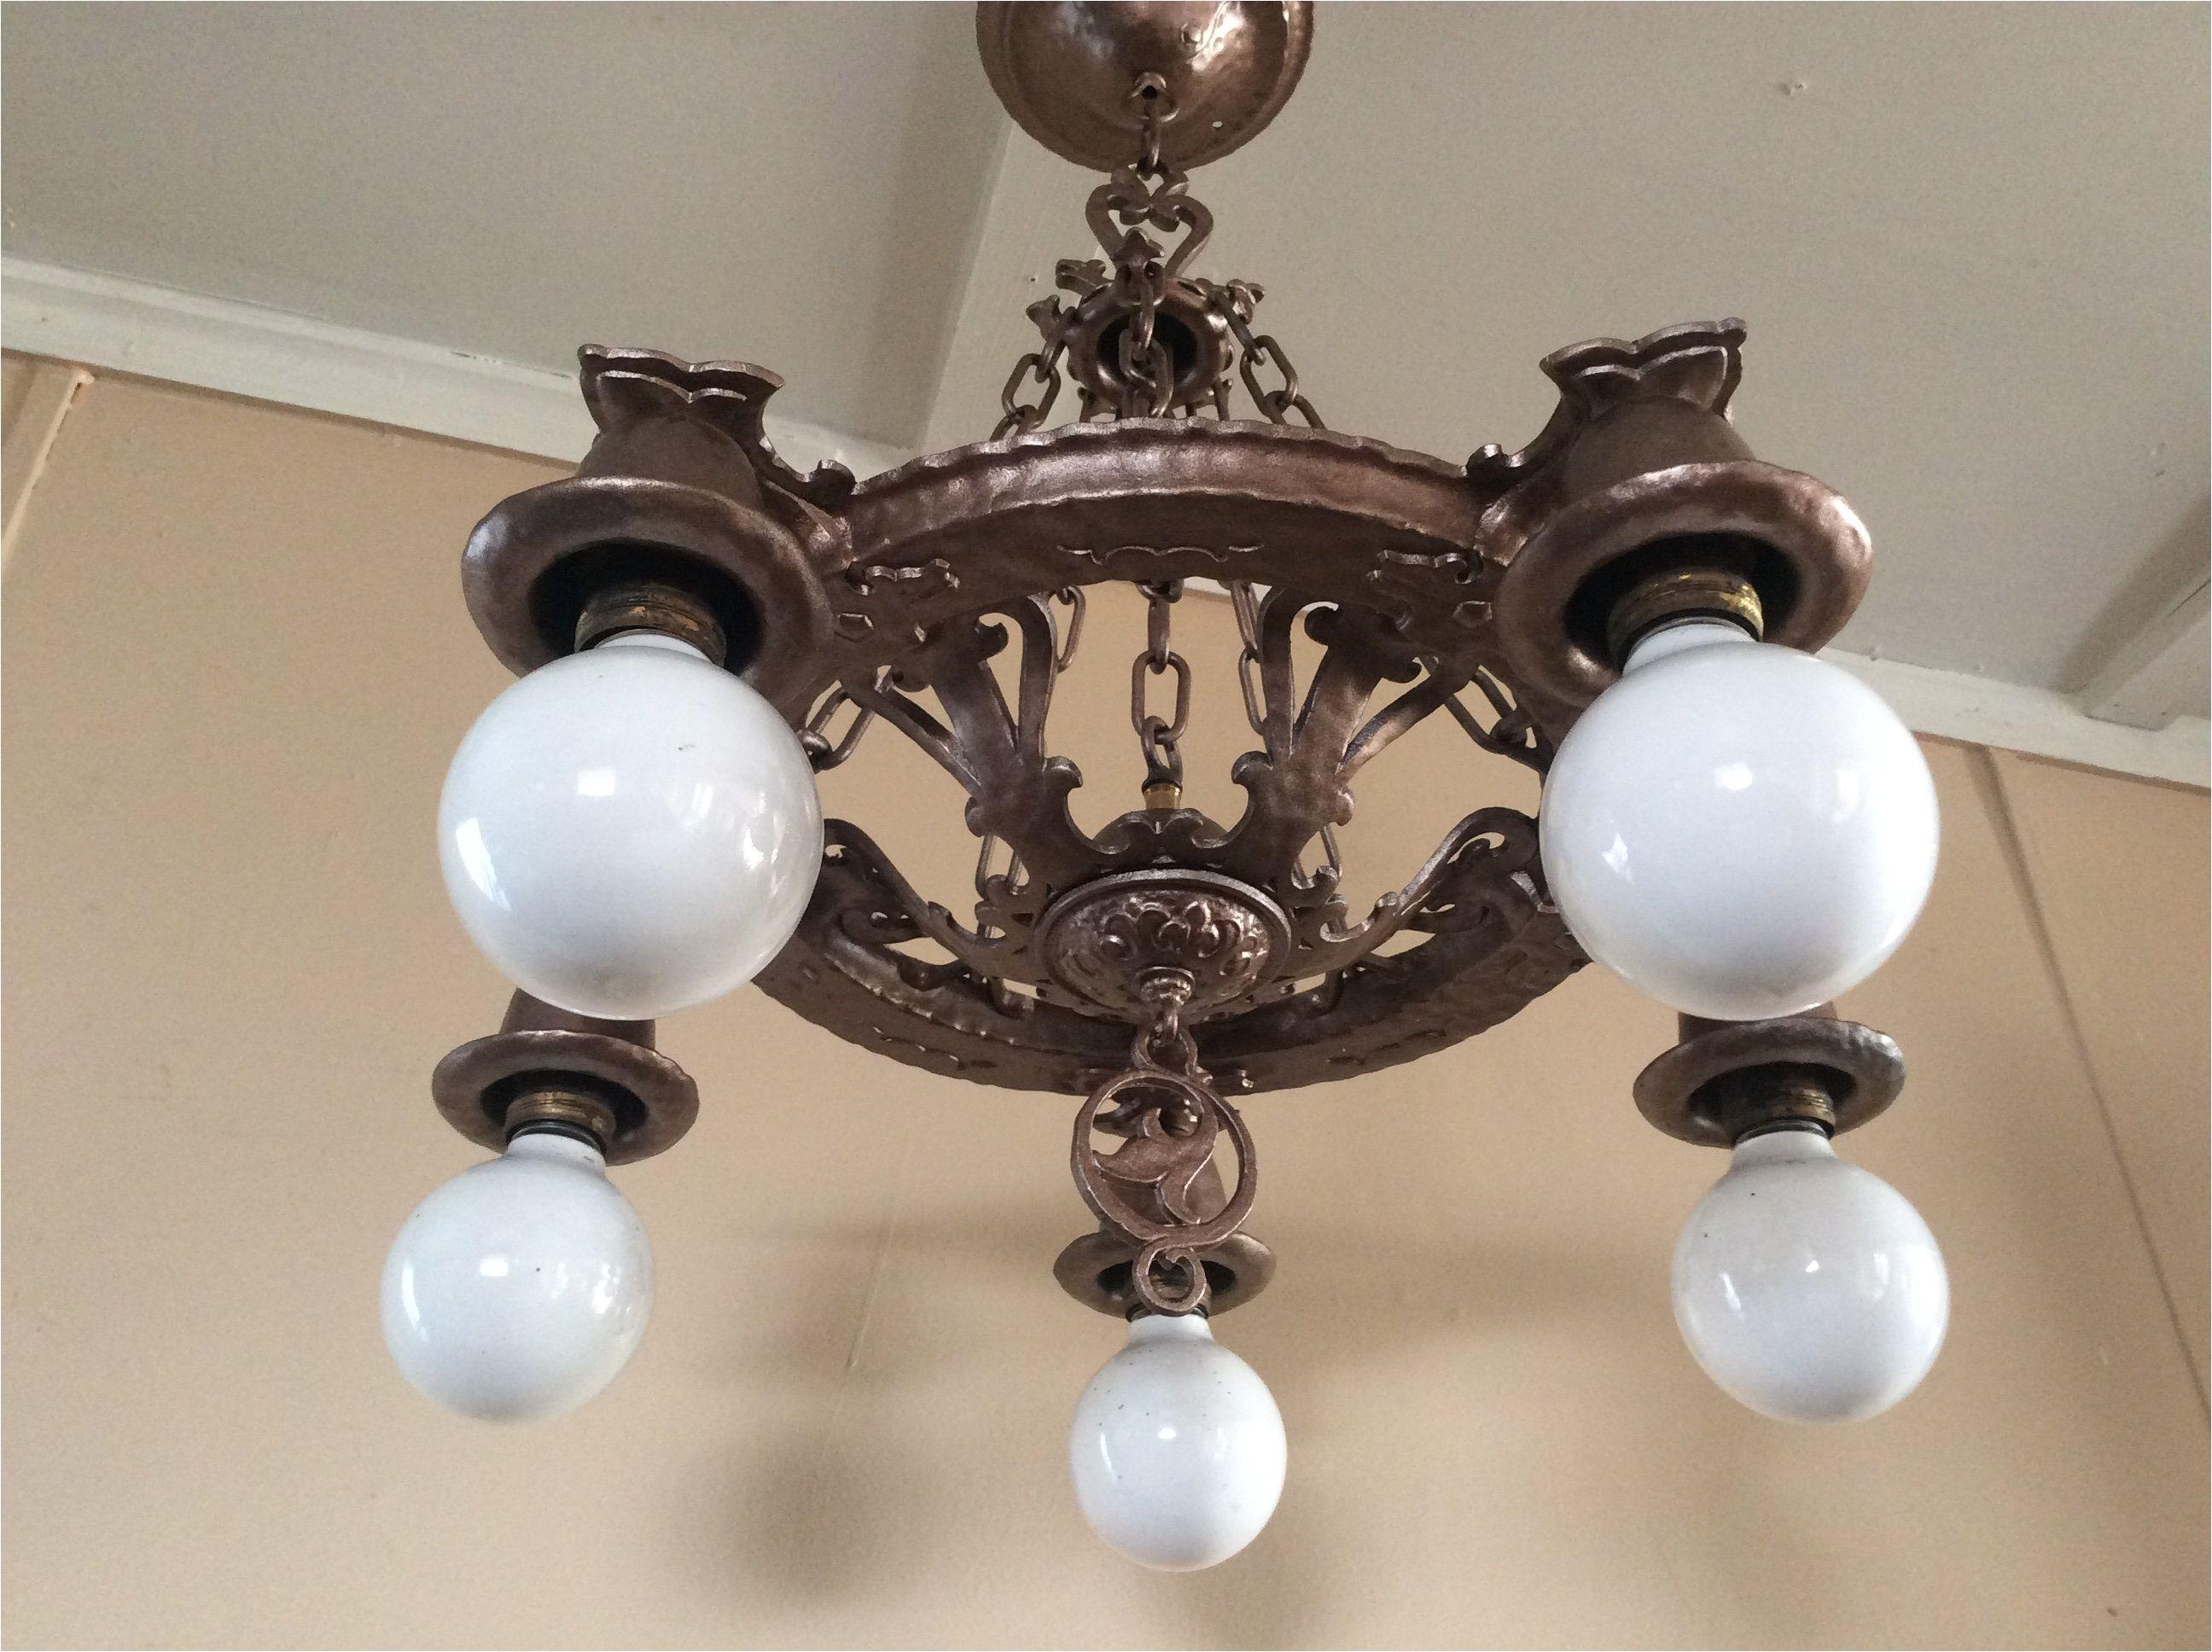 antique spanish revival hammered chandelier marked virden 1930 dragon or serpent heads